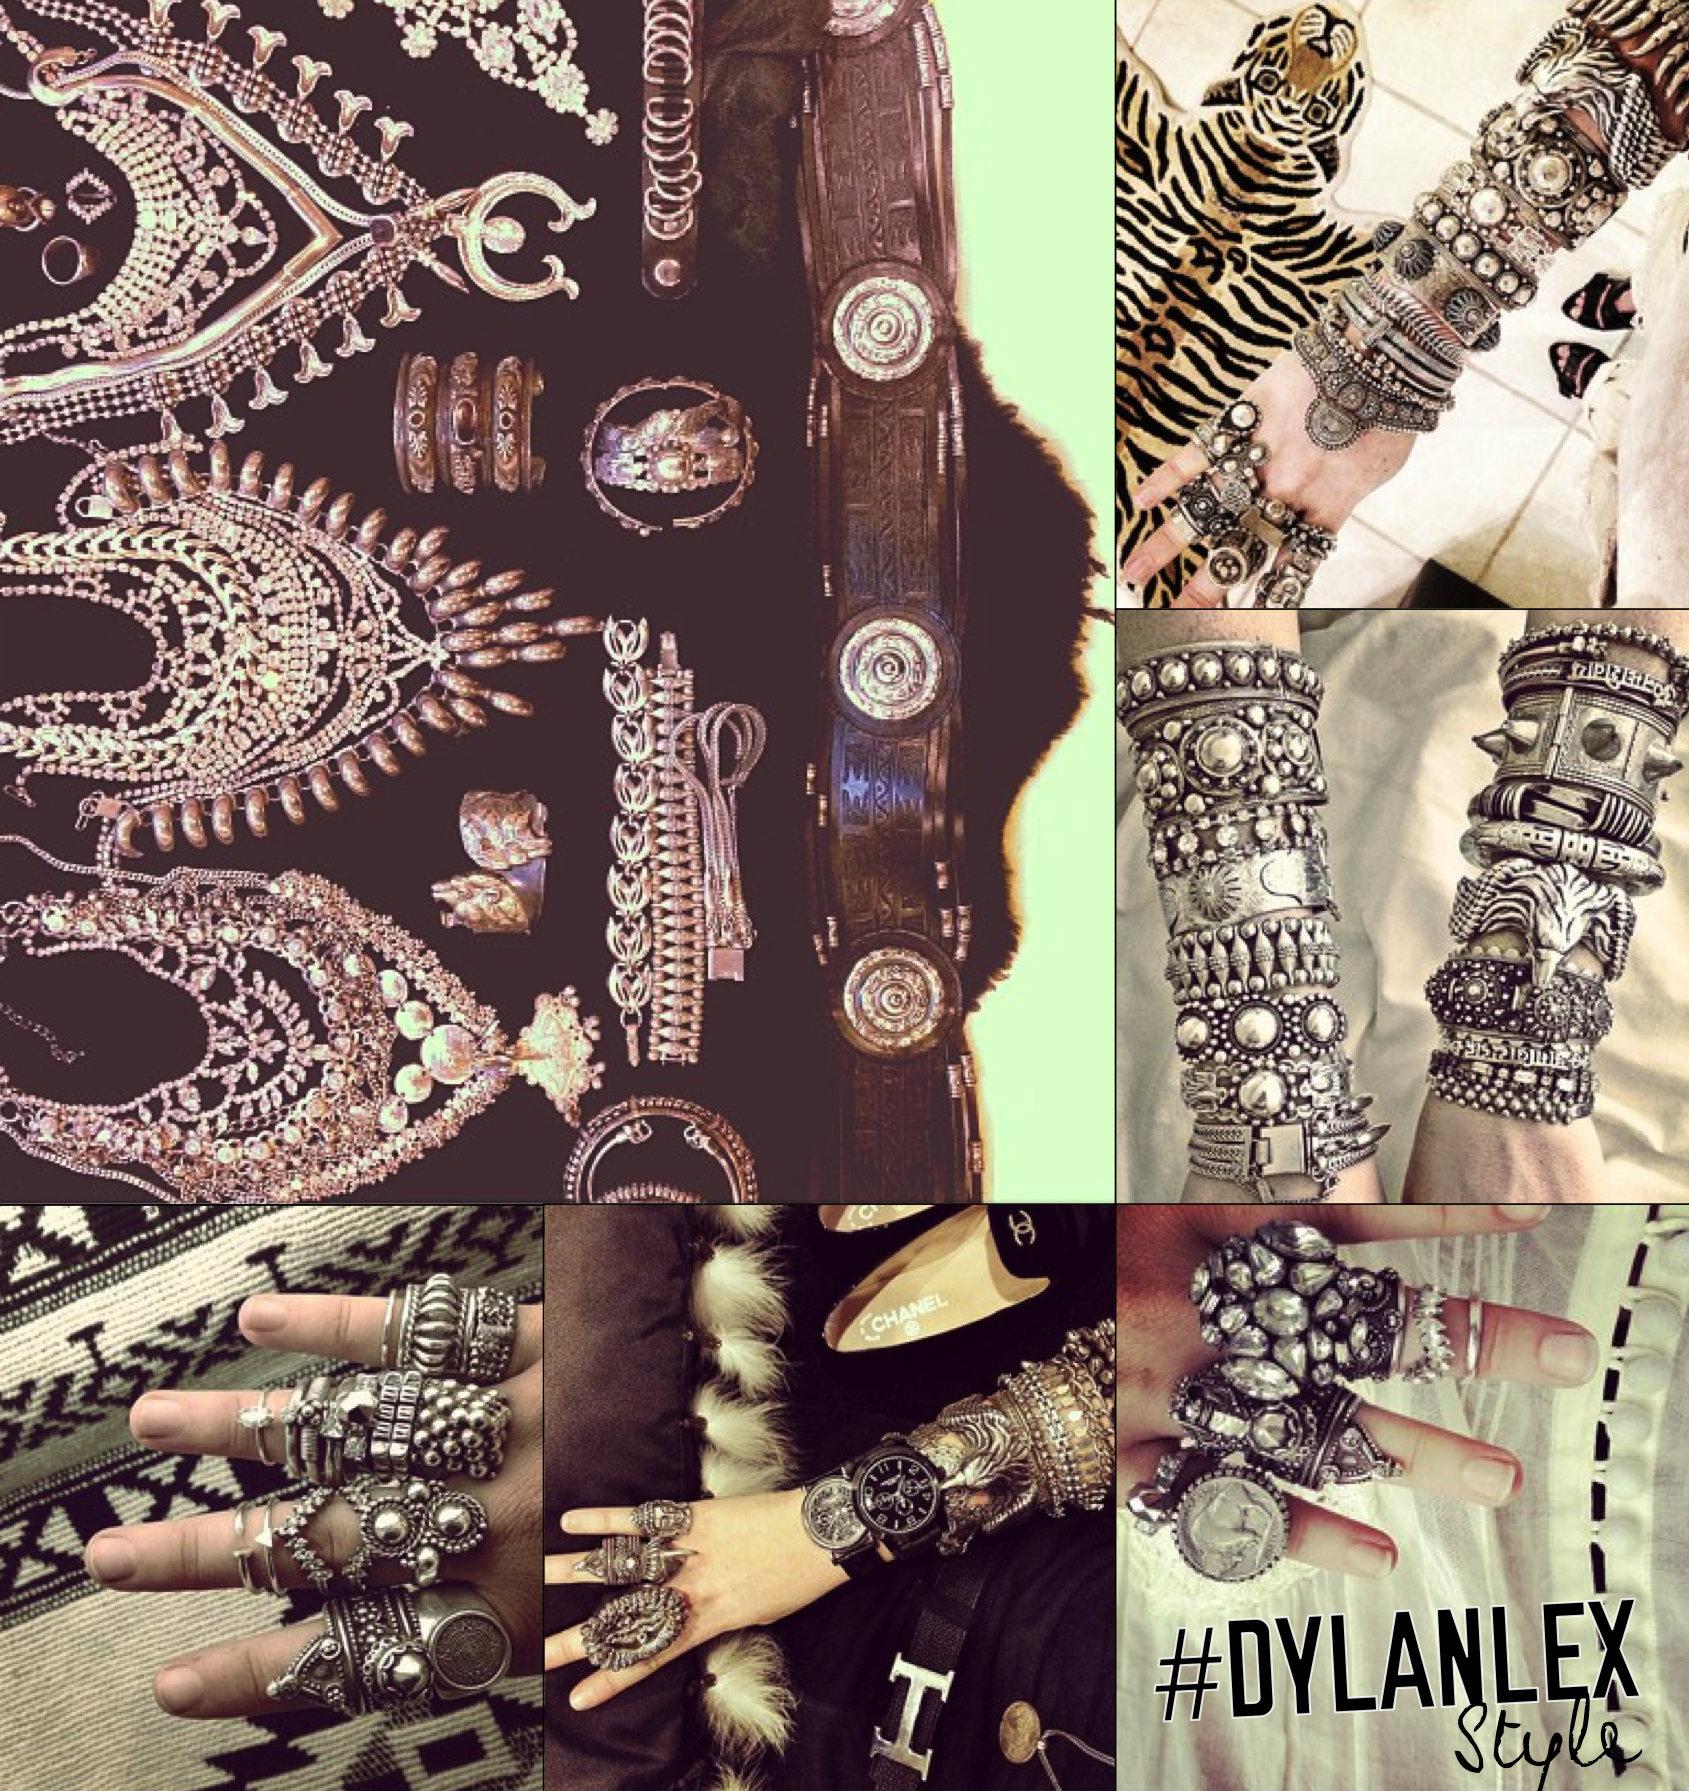 dylanlex 1